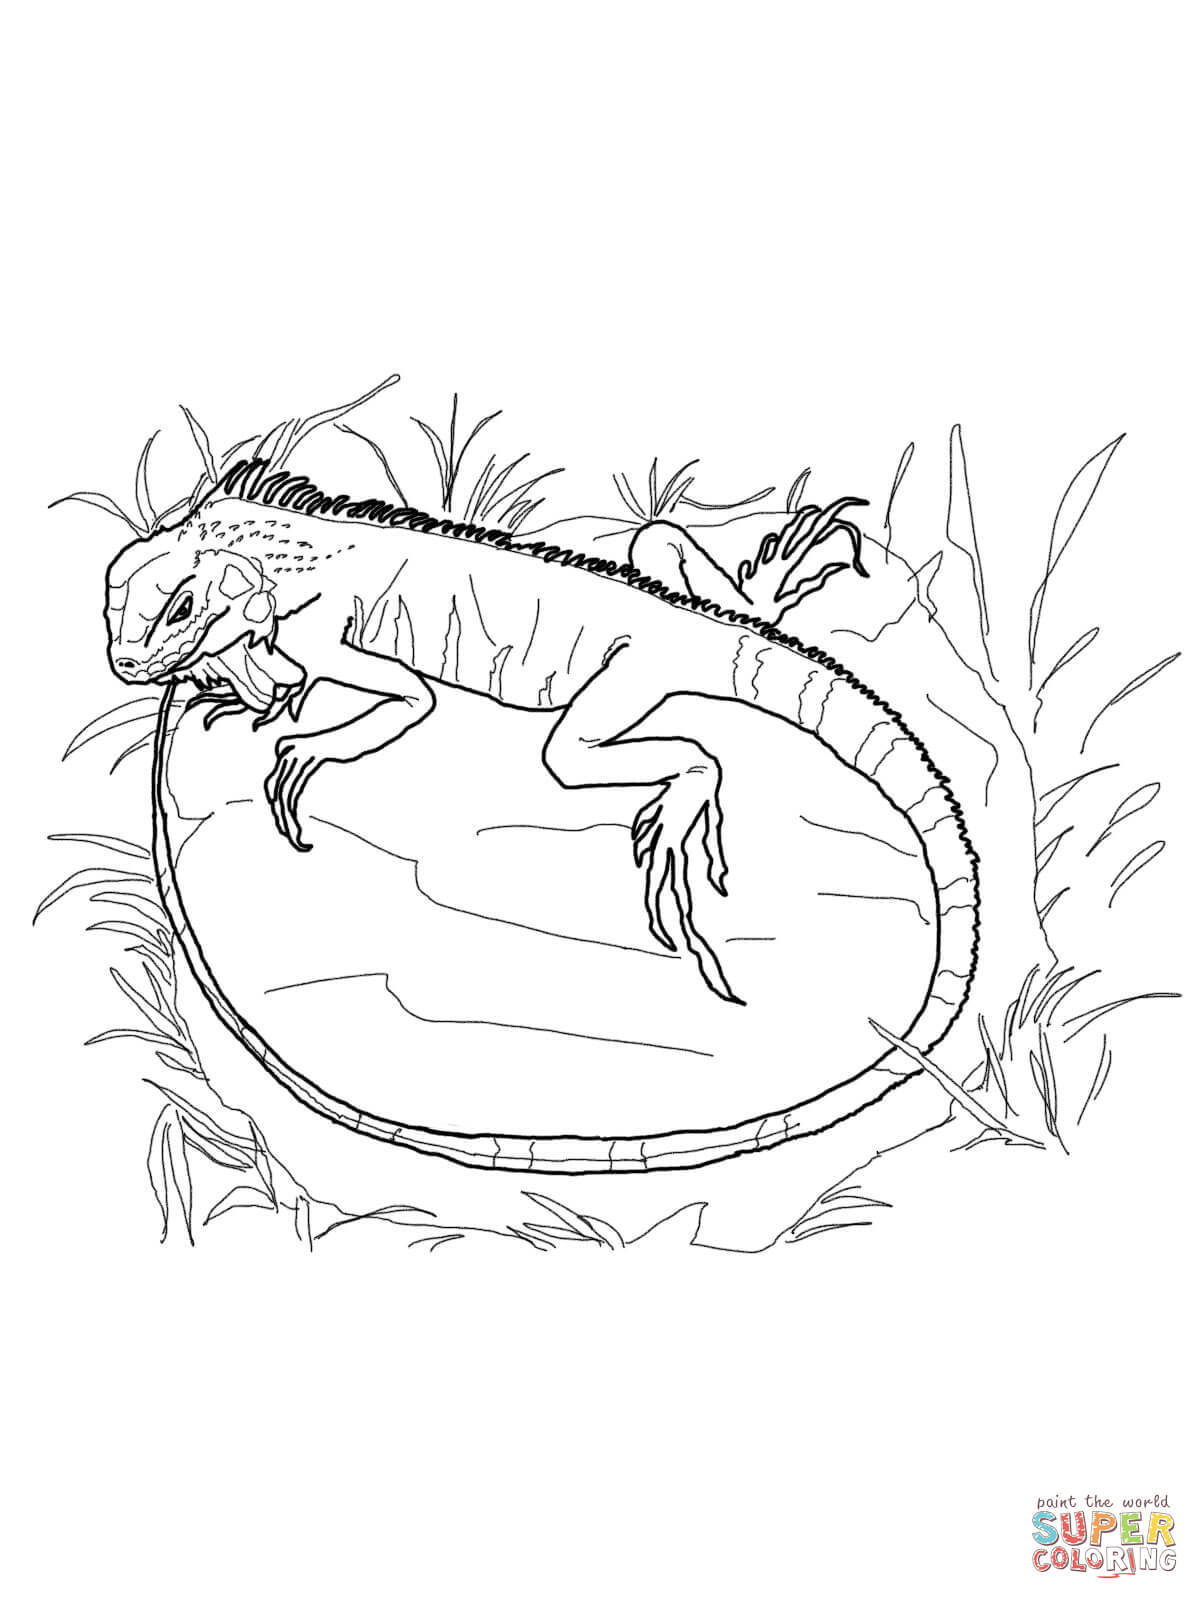 Green Iguana coloring #12, Download drawings